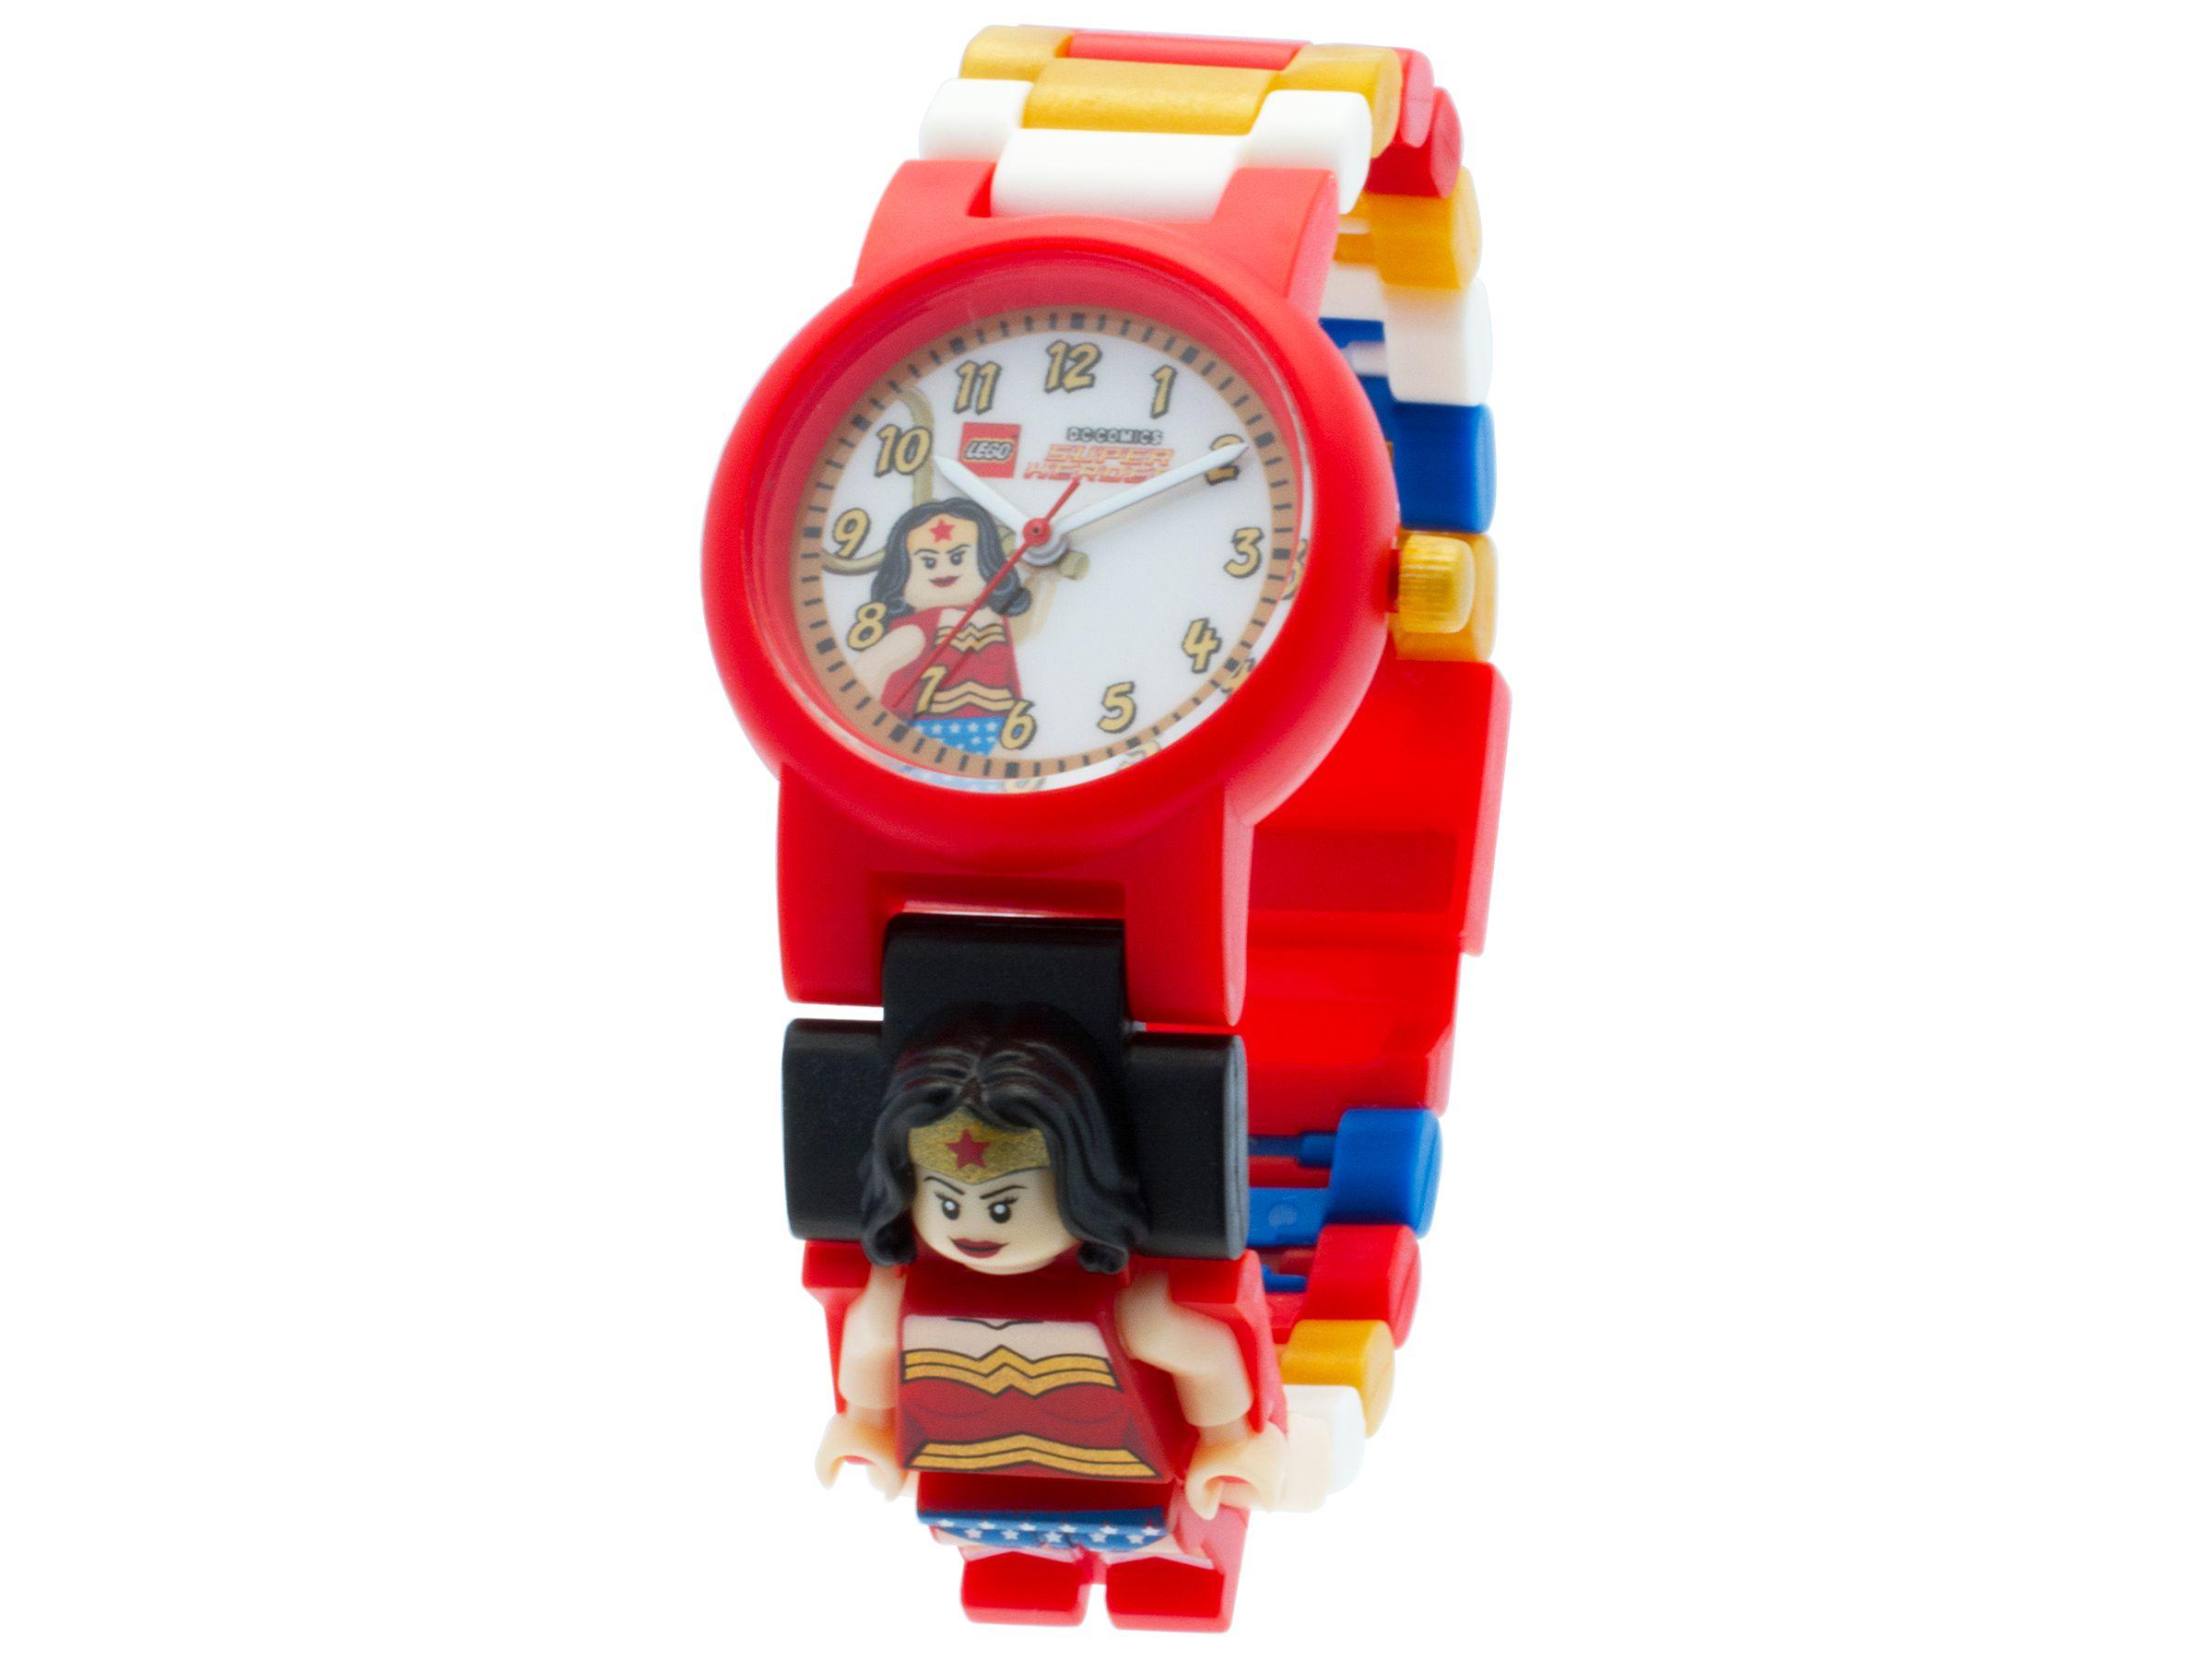 lego 5004539 wonder woman armbanduhr zum bauen 2015 ab 17 27 31 gespart wonder woman. Black Bedroom Furniture Sets. Home Design Ideas